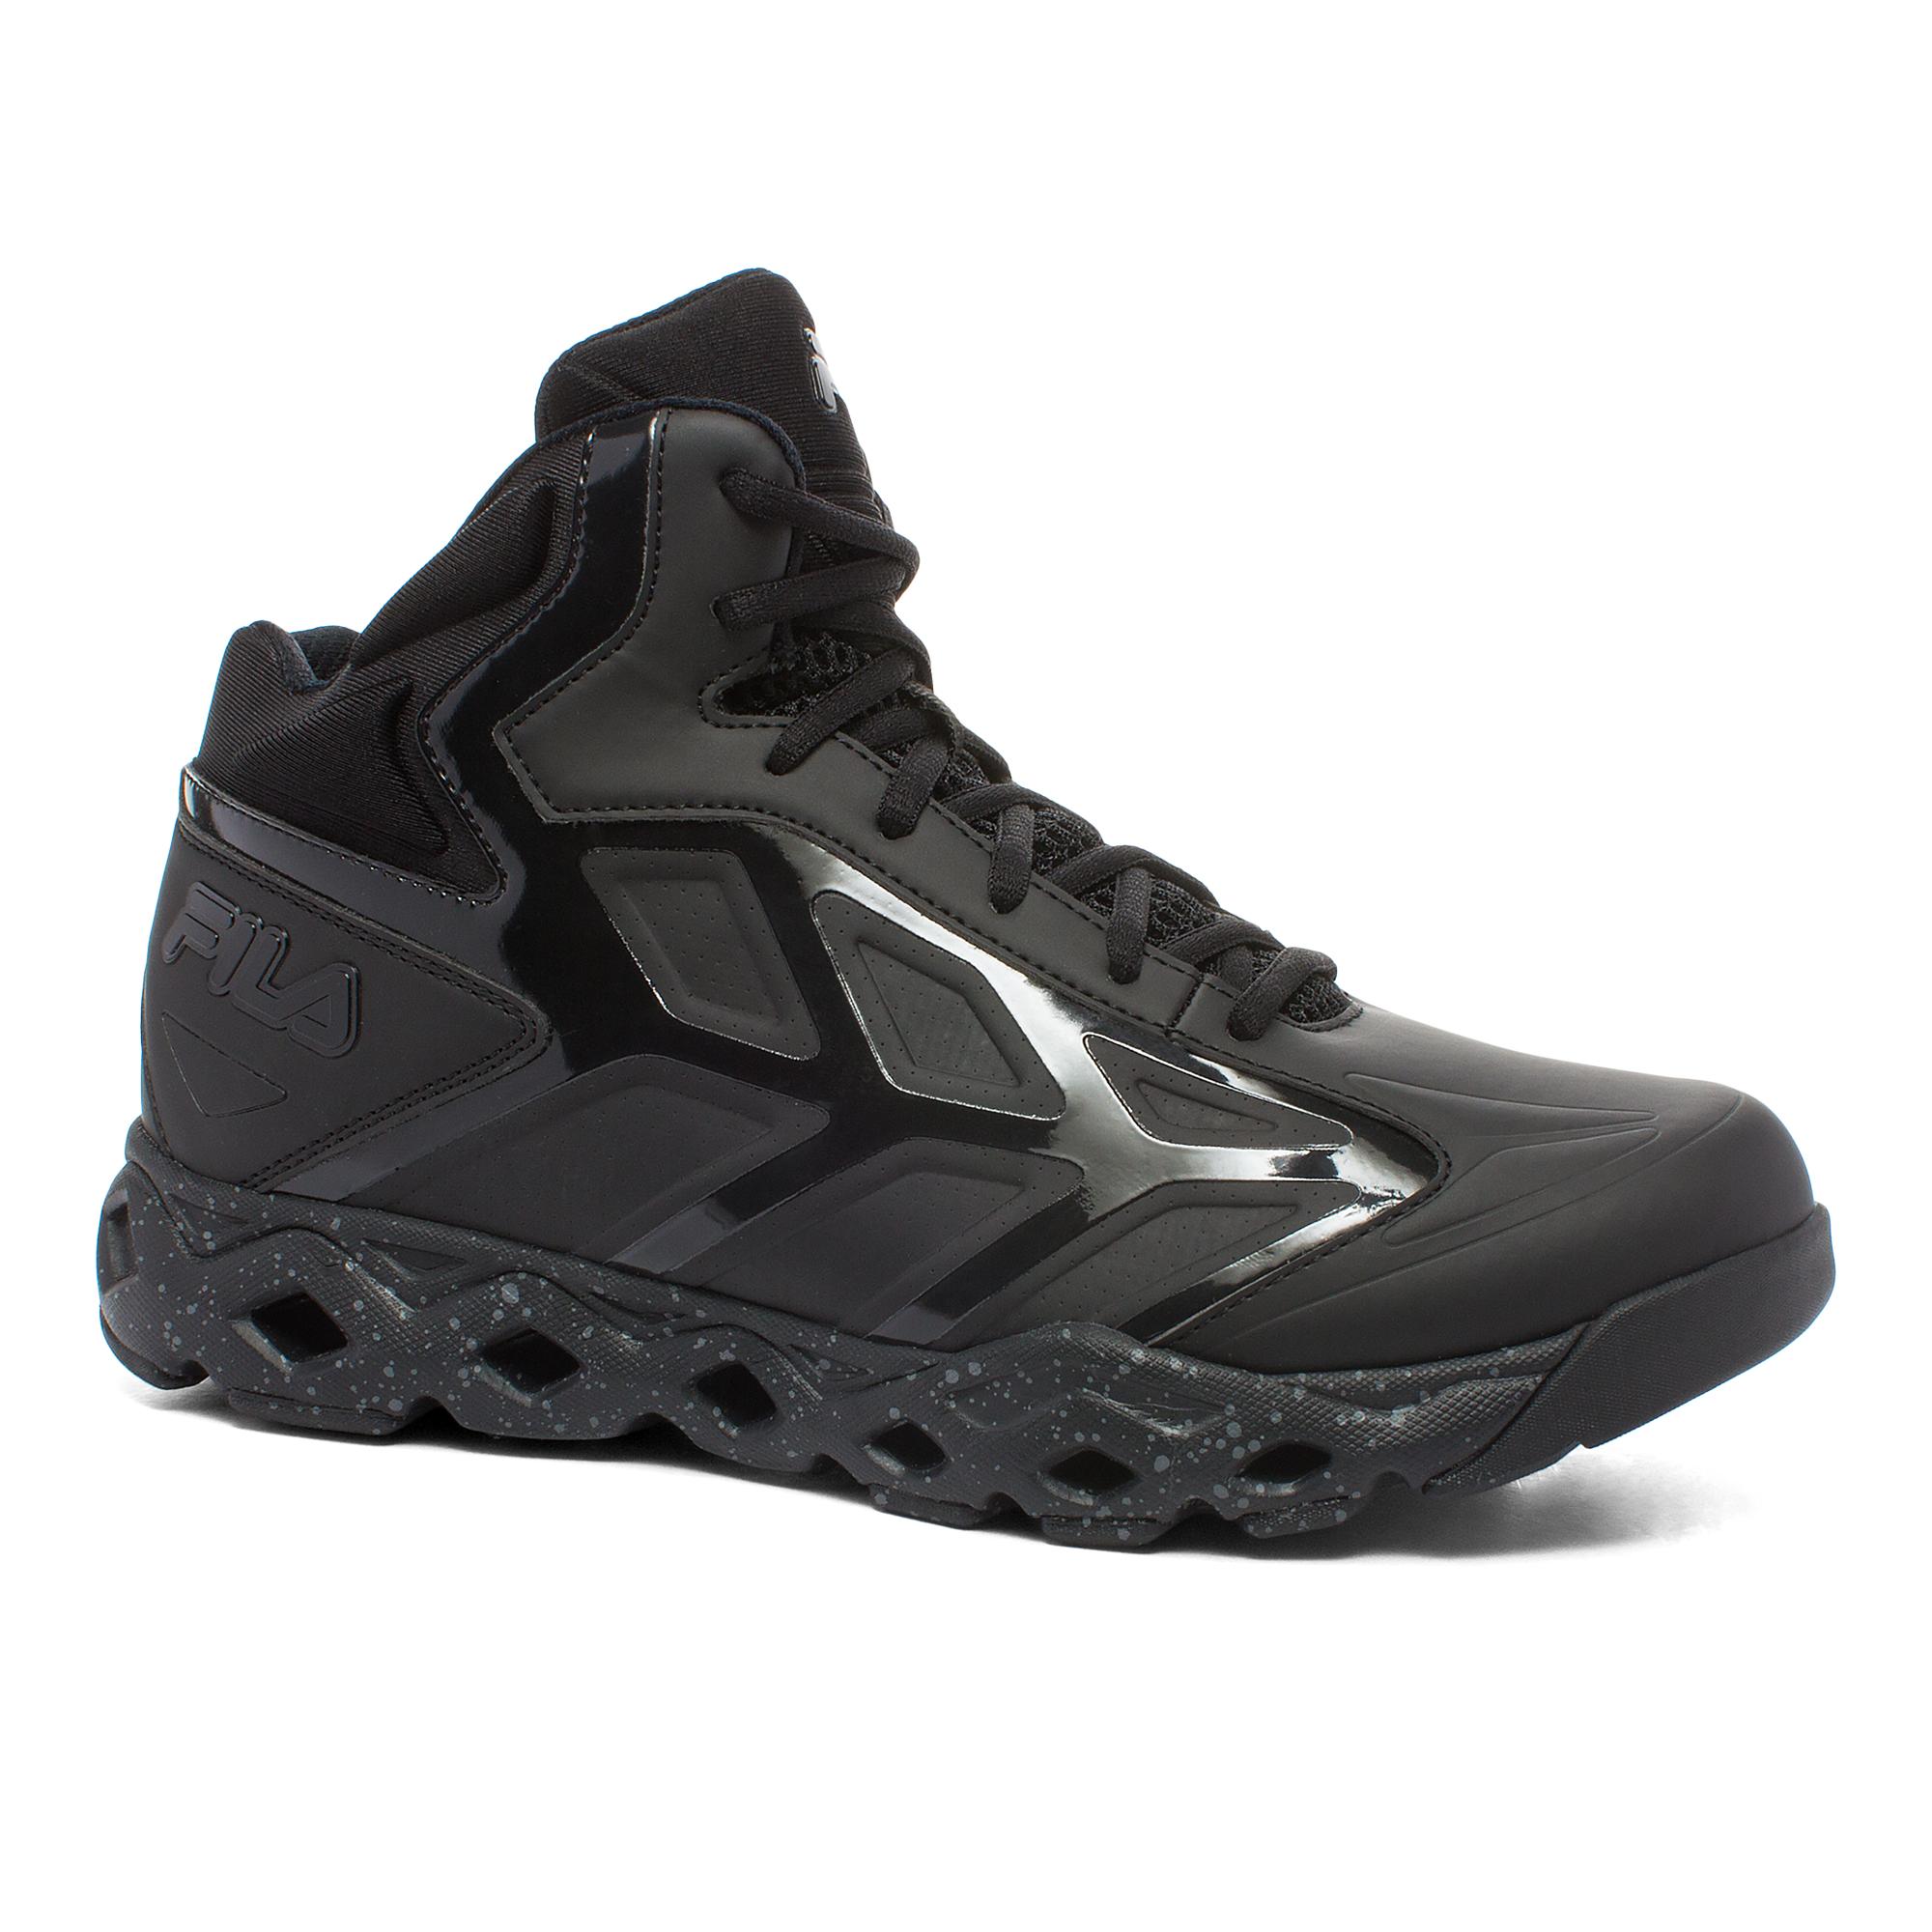 fila ebay. fila-men-039-s-torranado-basketball-shoe fila ebay -